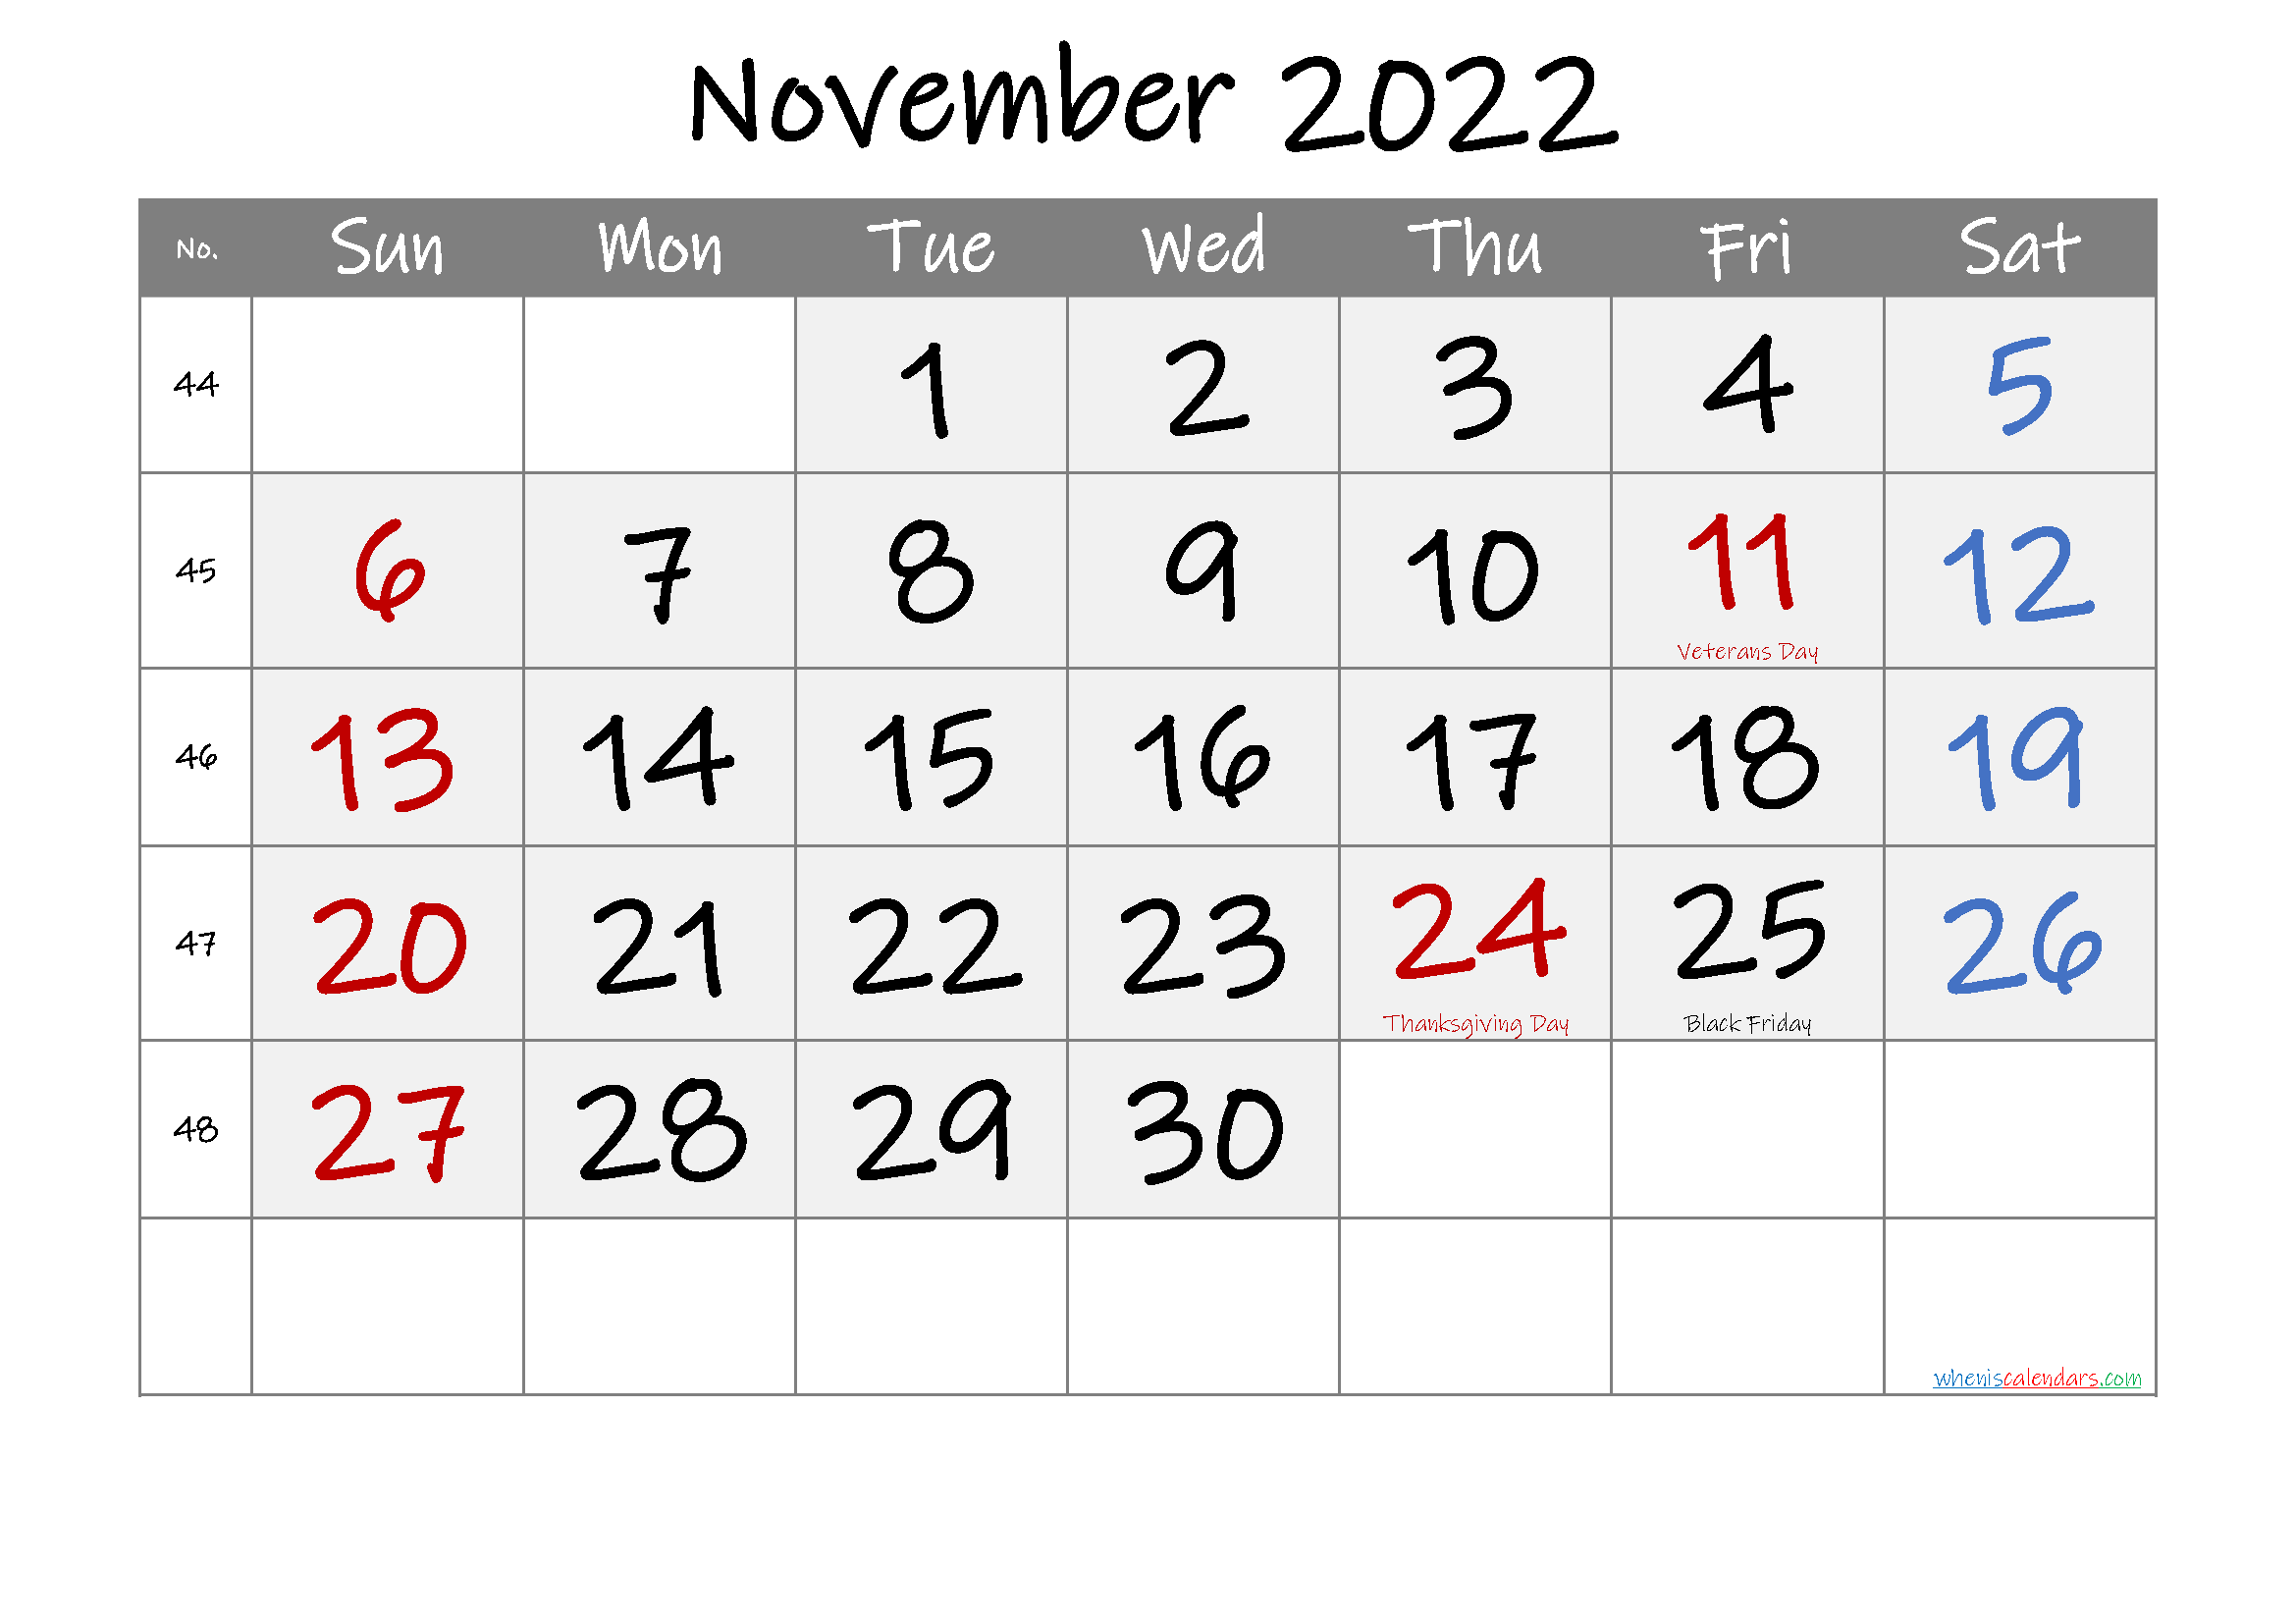 Printable November 2022 Calendar.Free Printable November 2022 Calendar Calendar Printables Printable Calendar Template Monthly Calendar Printable